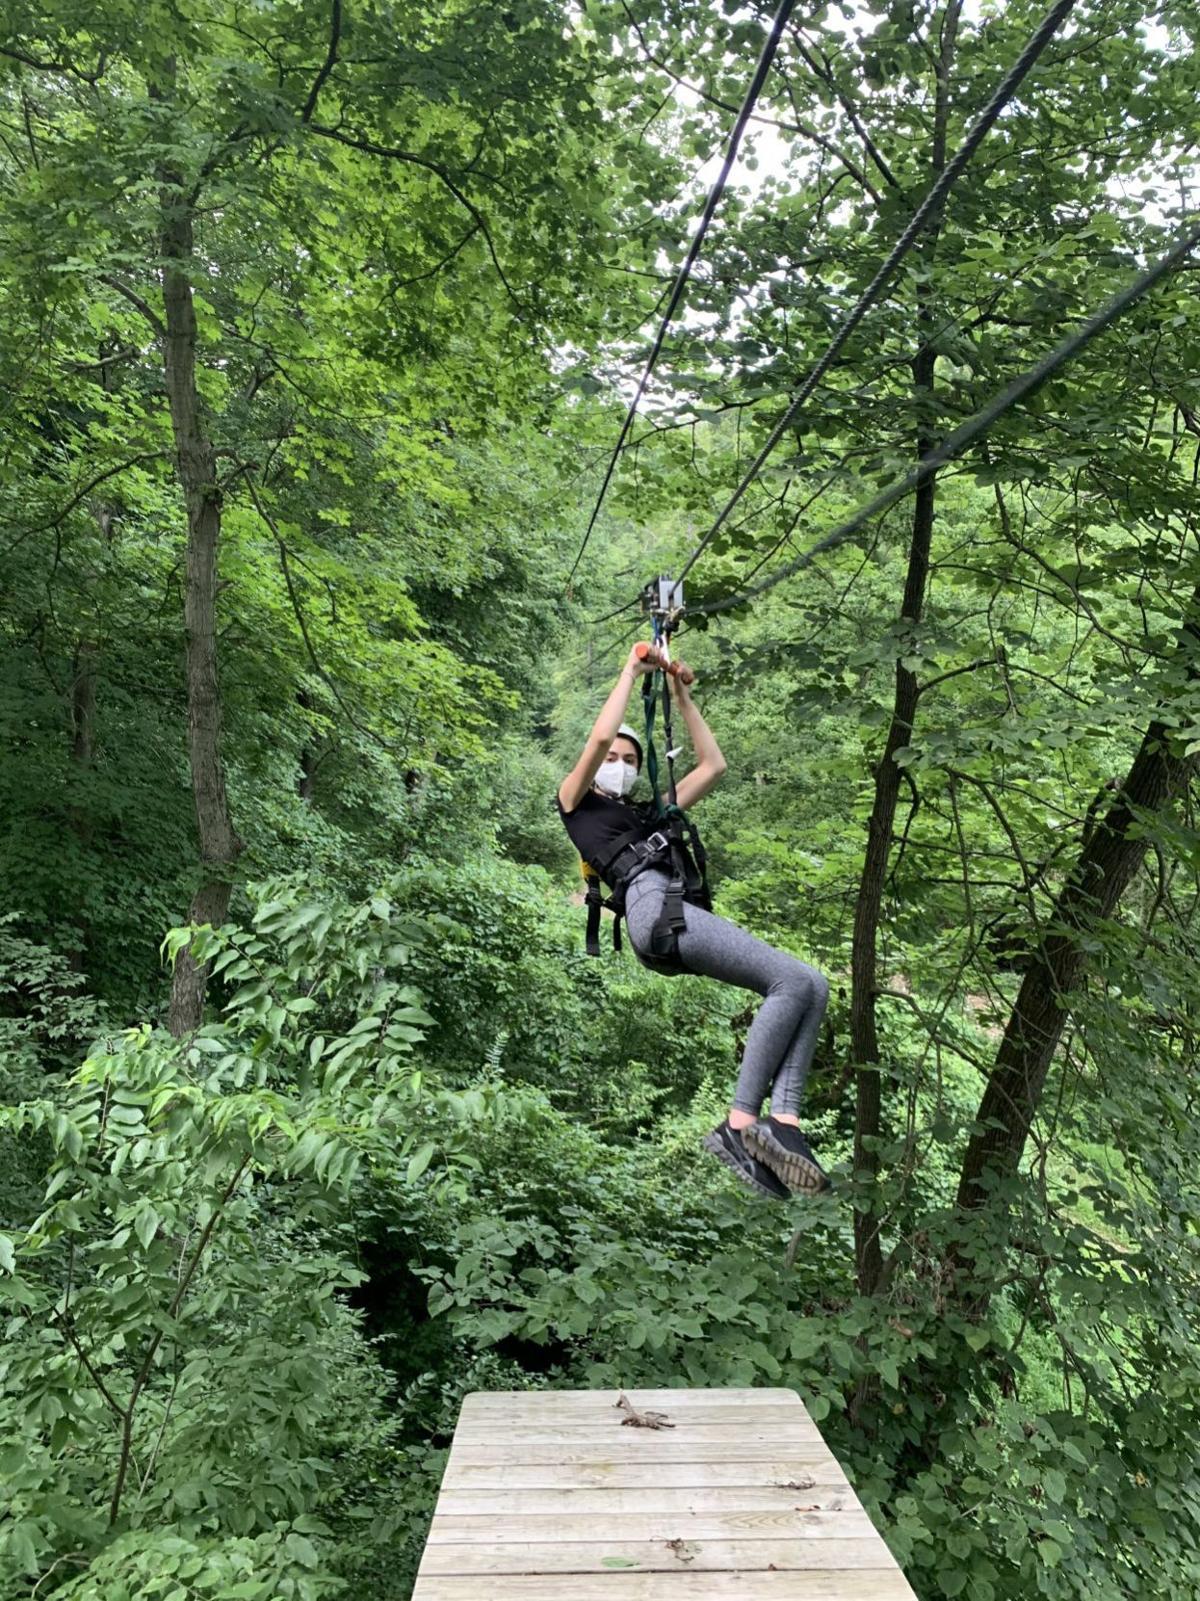 Staycation — ziplining grafton